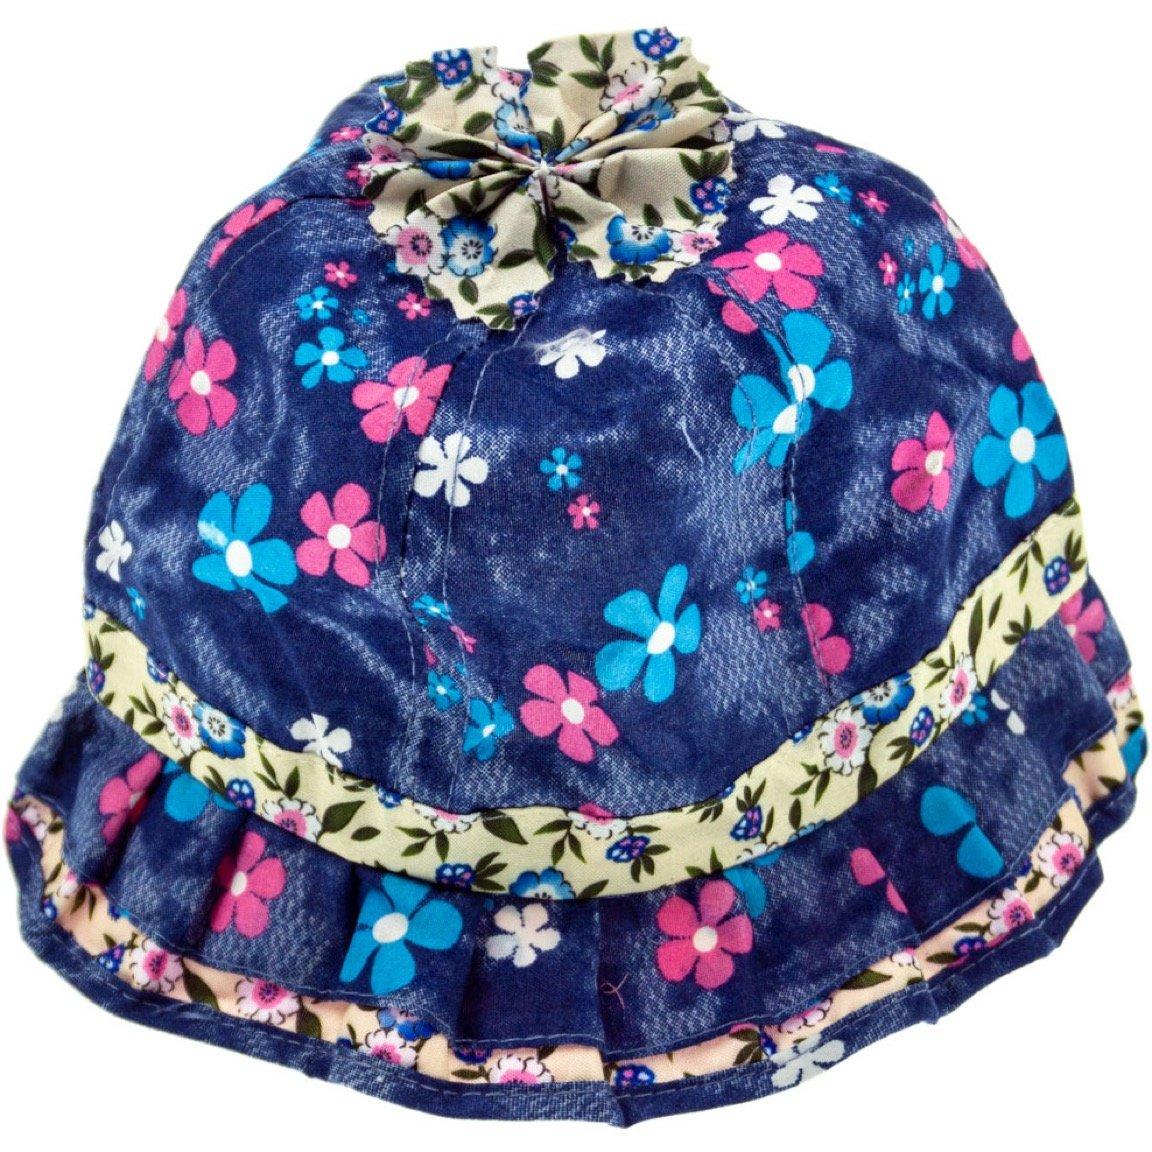 Georgia Accessories παιδικό καπέλο «Daisy Garden»